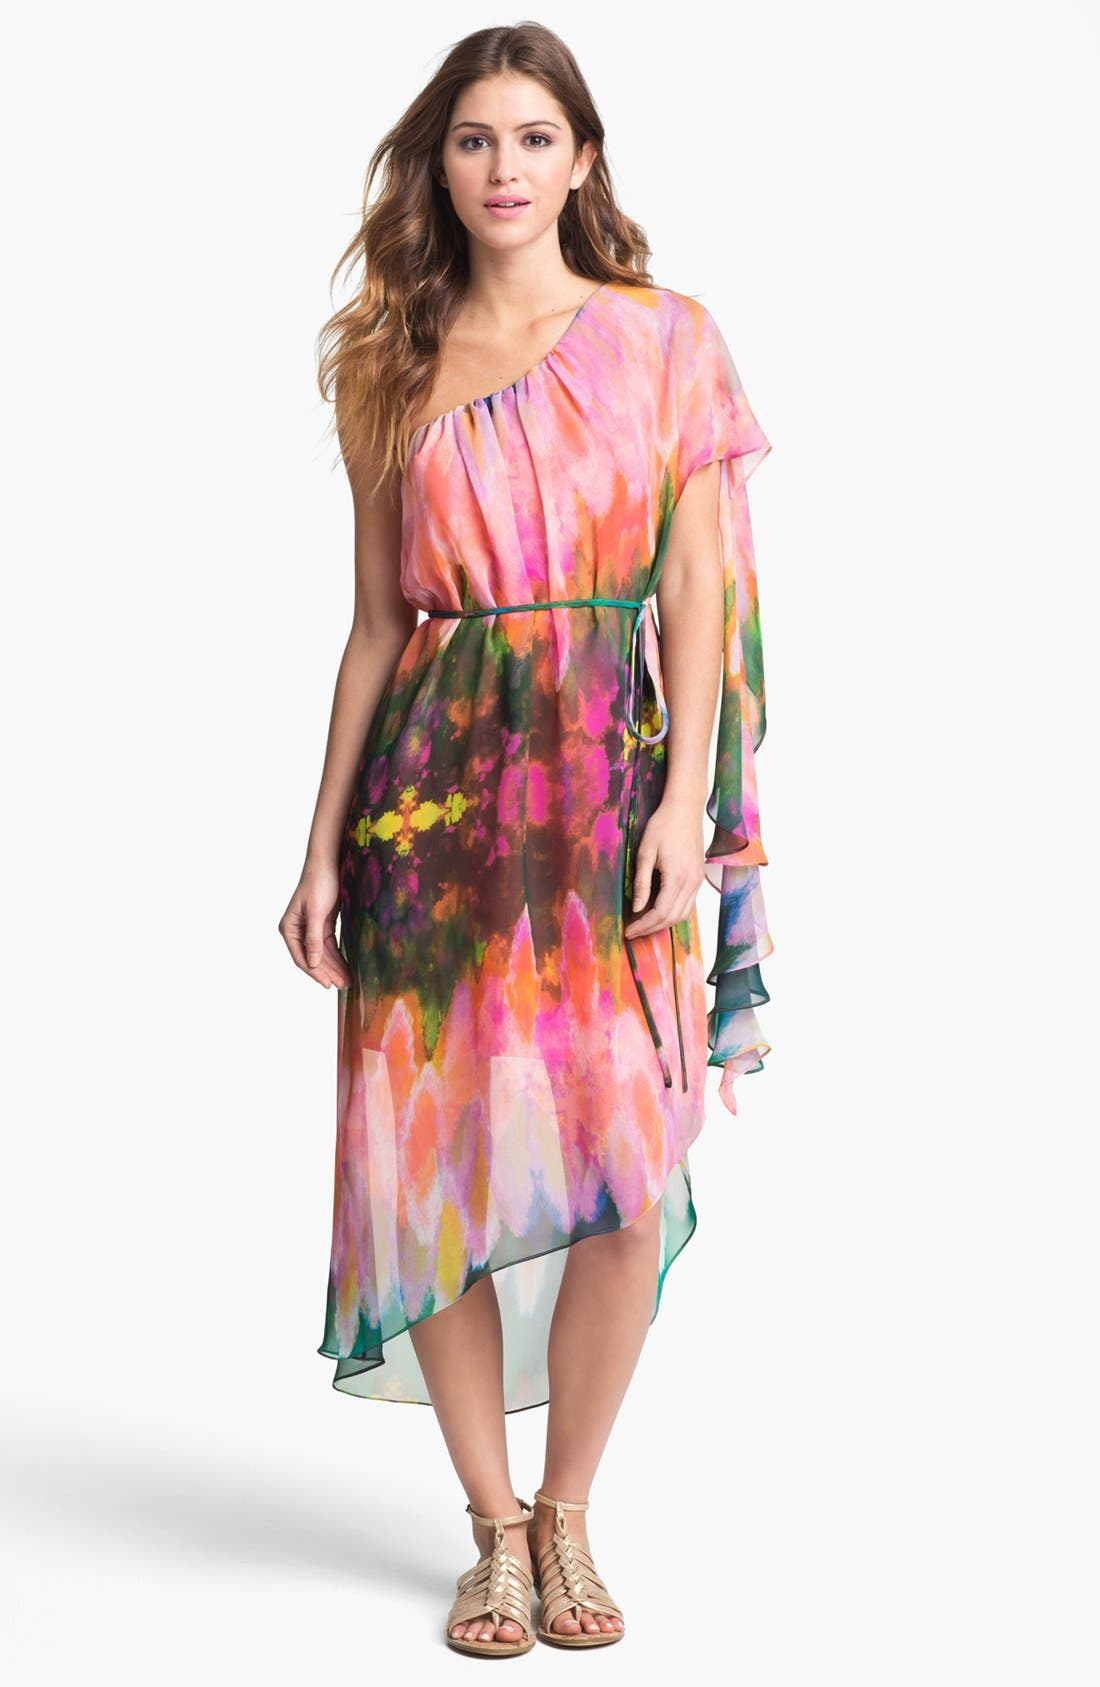 Main Image - Abi Ferrin 'Hera' One Shoulder Print Chiffon Dress